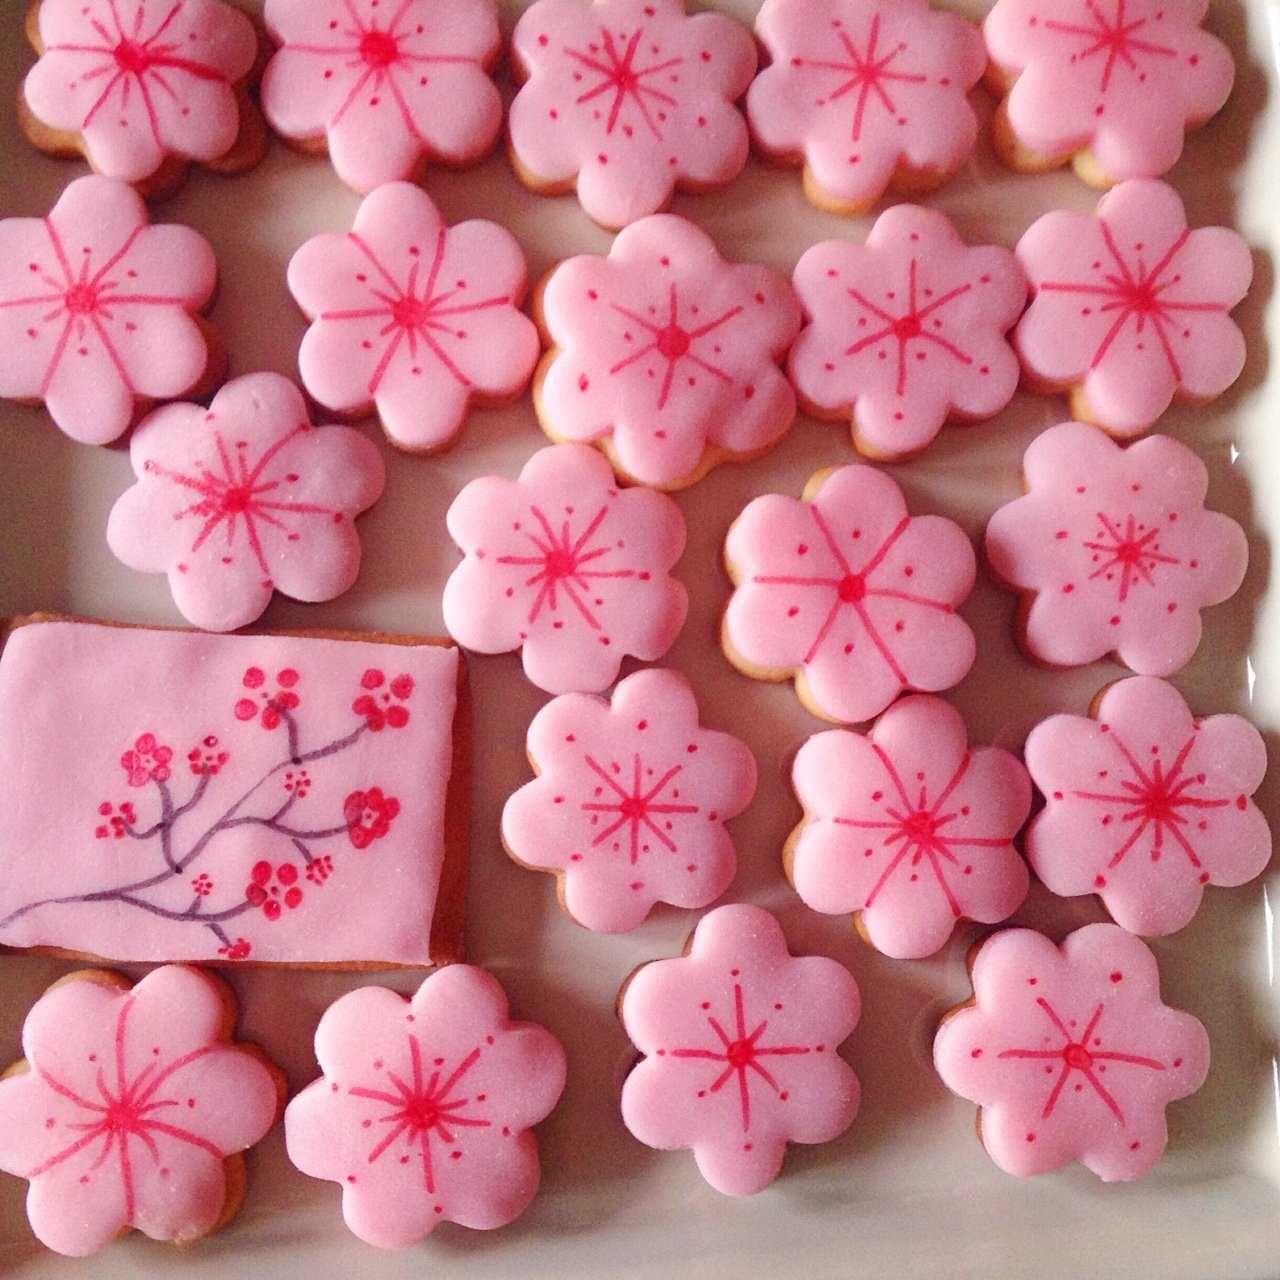 Sablés Sakura en 2020 | Fleur de cerisier, Artisanat de fleurs et Fleur de sakura